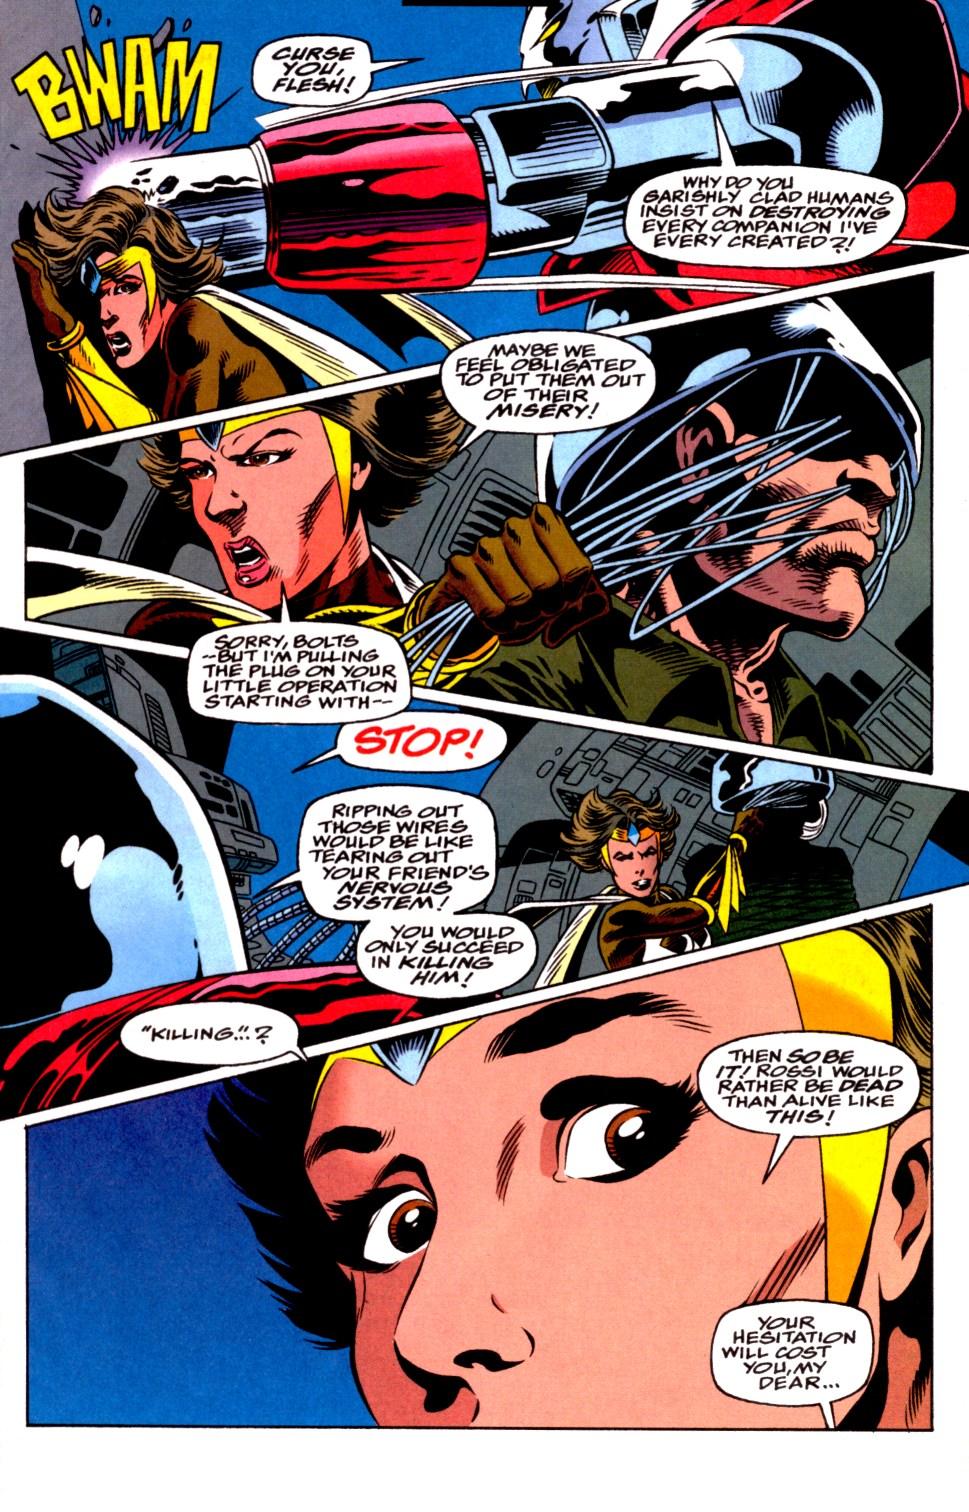 Read online Blackwulf comic -  Issue #4 - 21